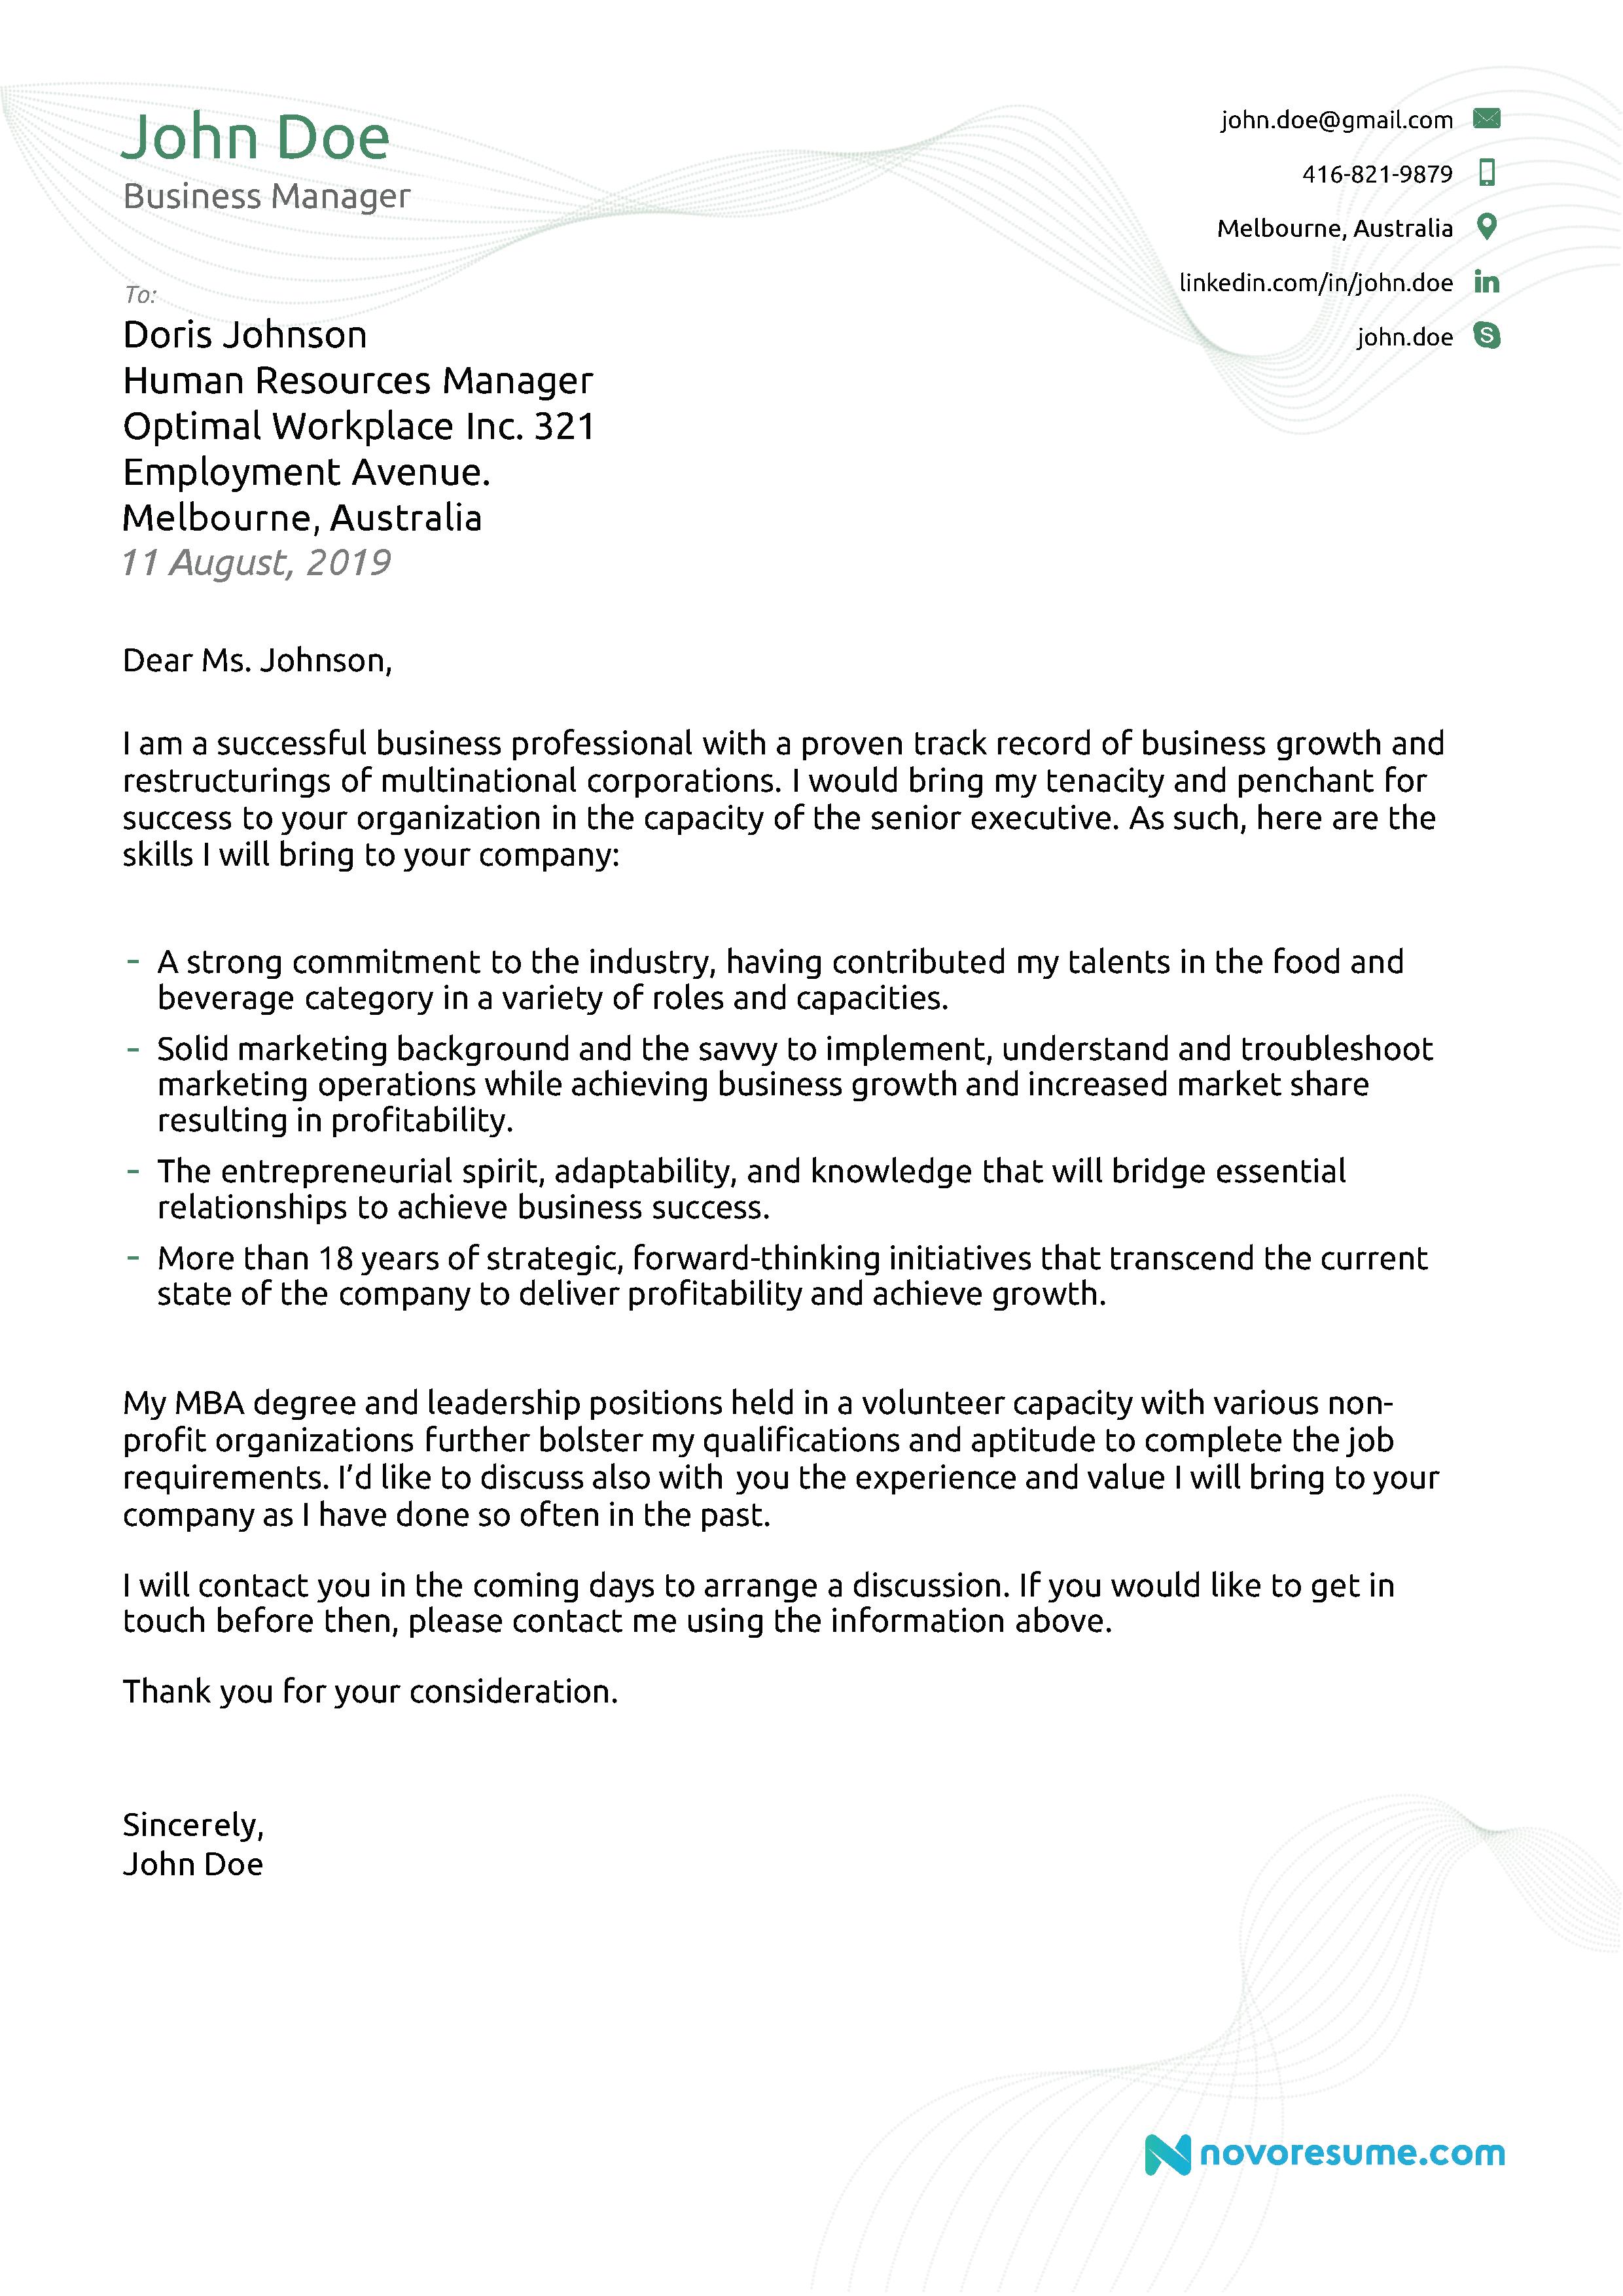 cover letter sample without experience (görüntüler ile) career objective for waitress fabrication engineer resume server skills